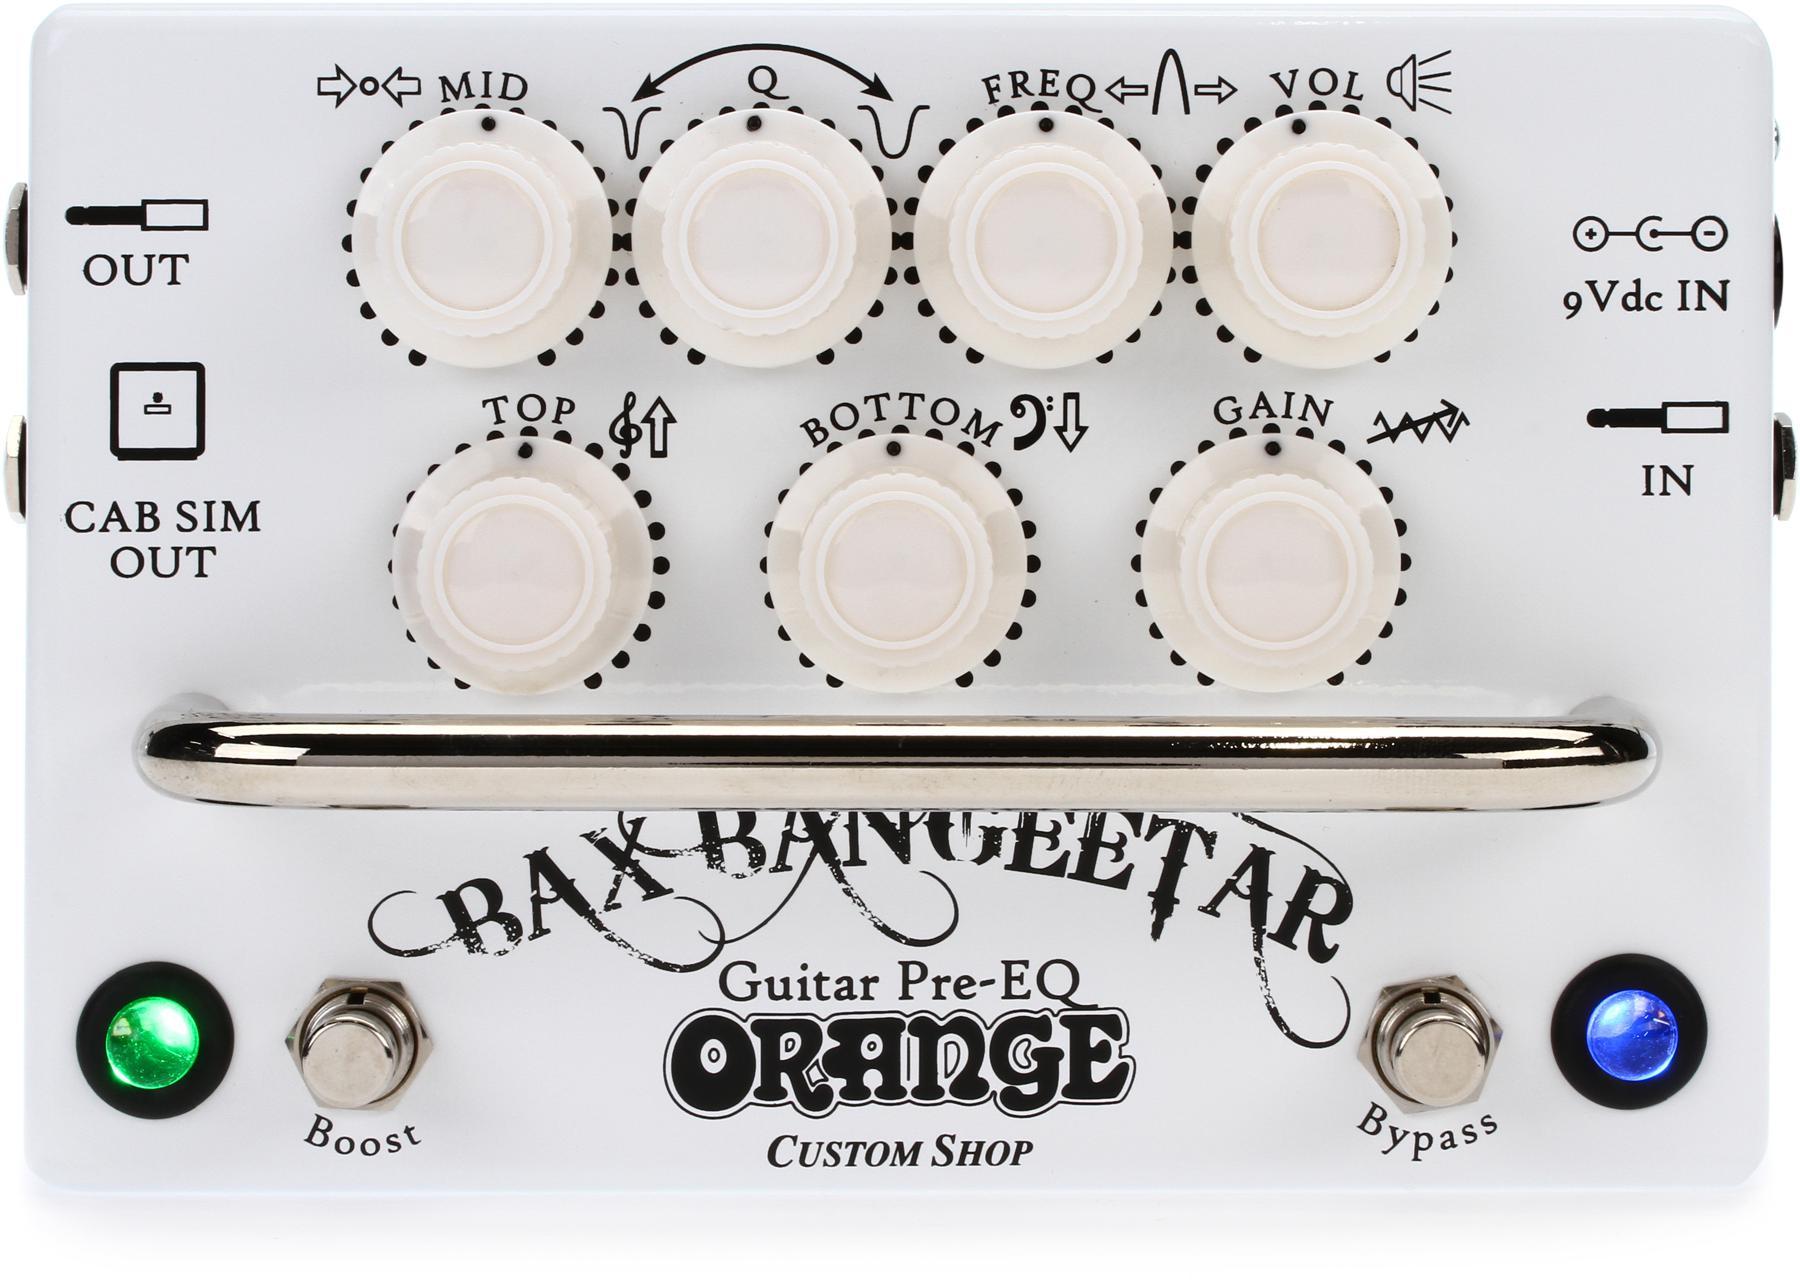 5. Orange Bax Bangeetar Guitar Pre-EQ Pedal – White